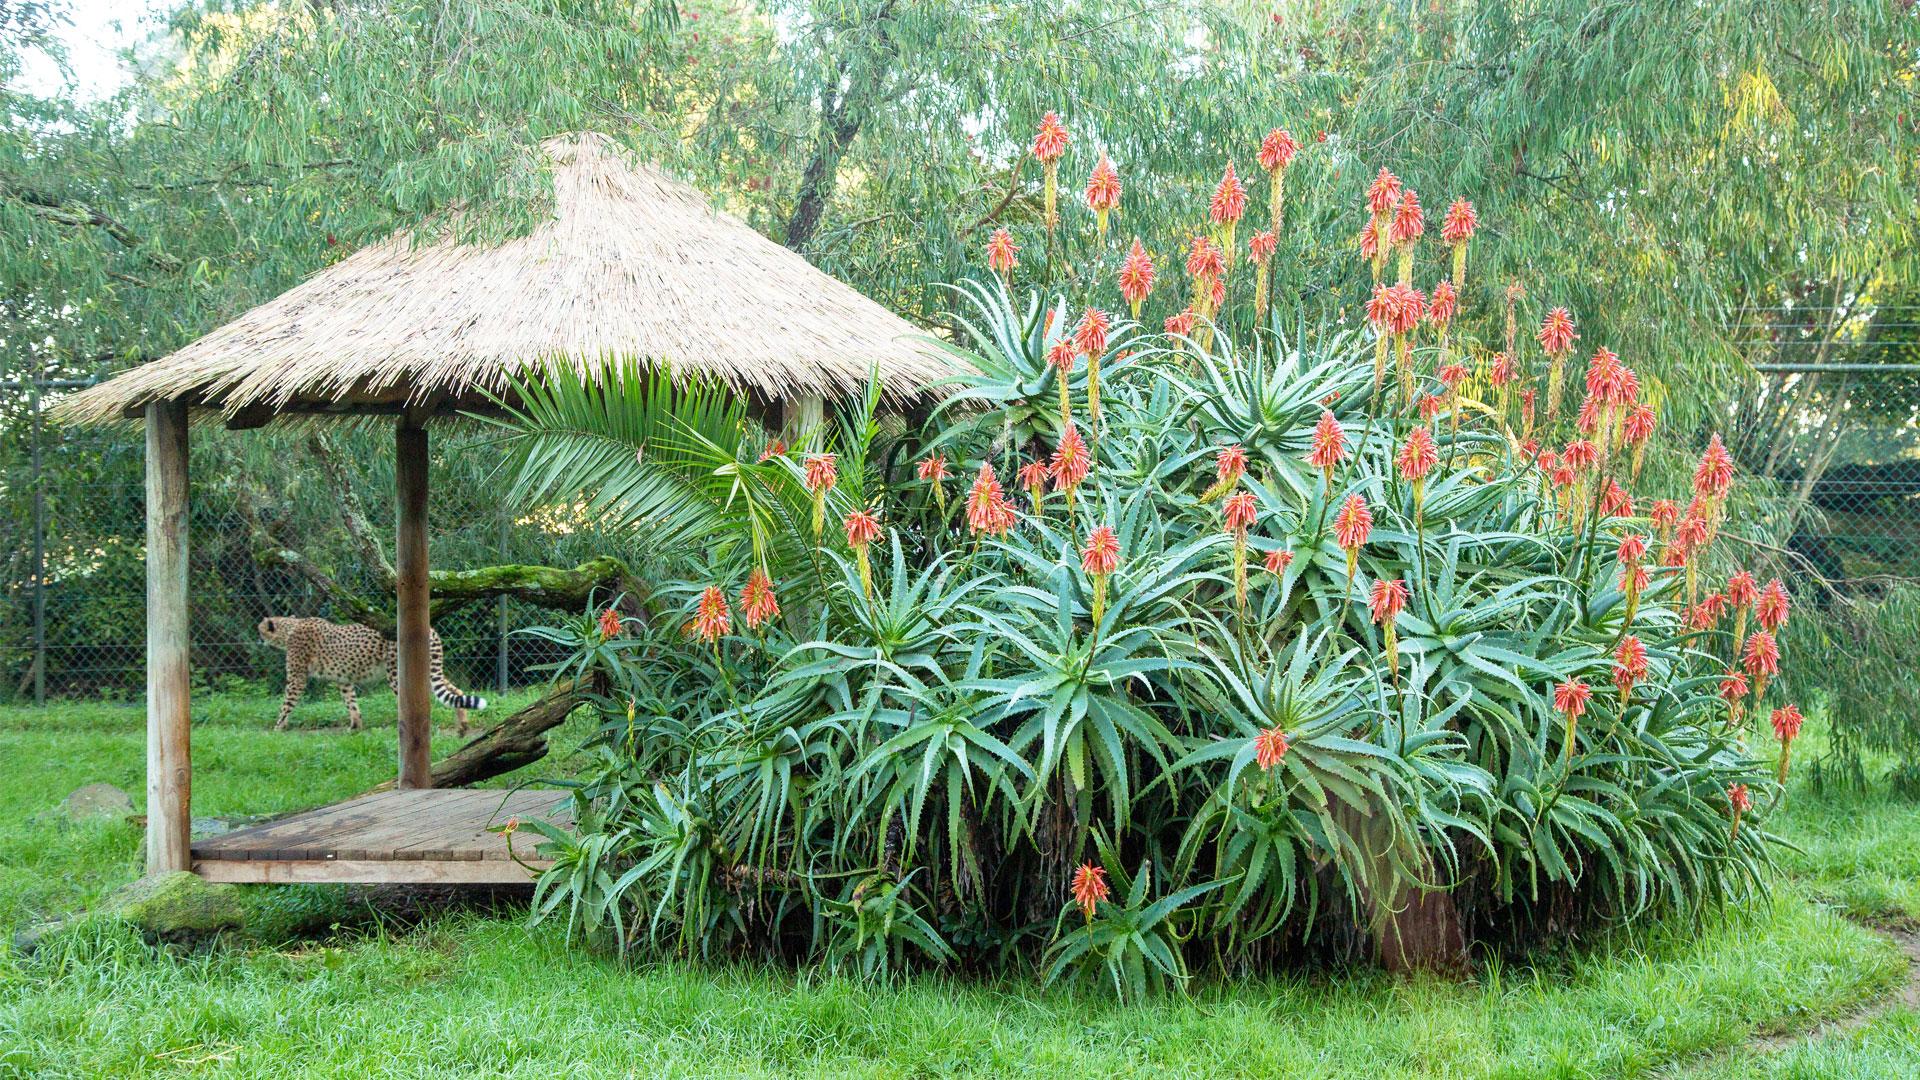 https://rfacdn.nz/zoo/assets/media/horticulture-blog-aloe-gallery-3.jpg